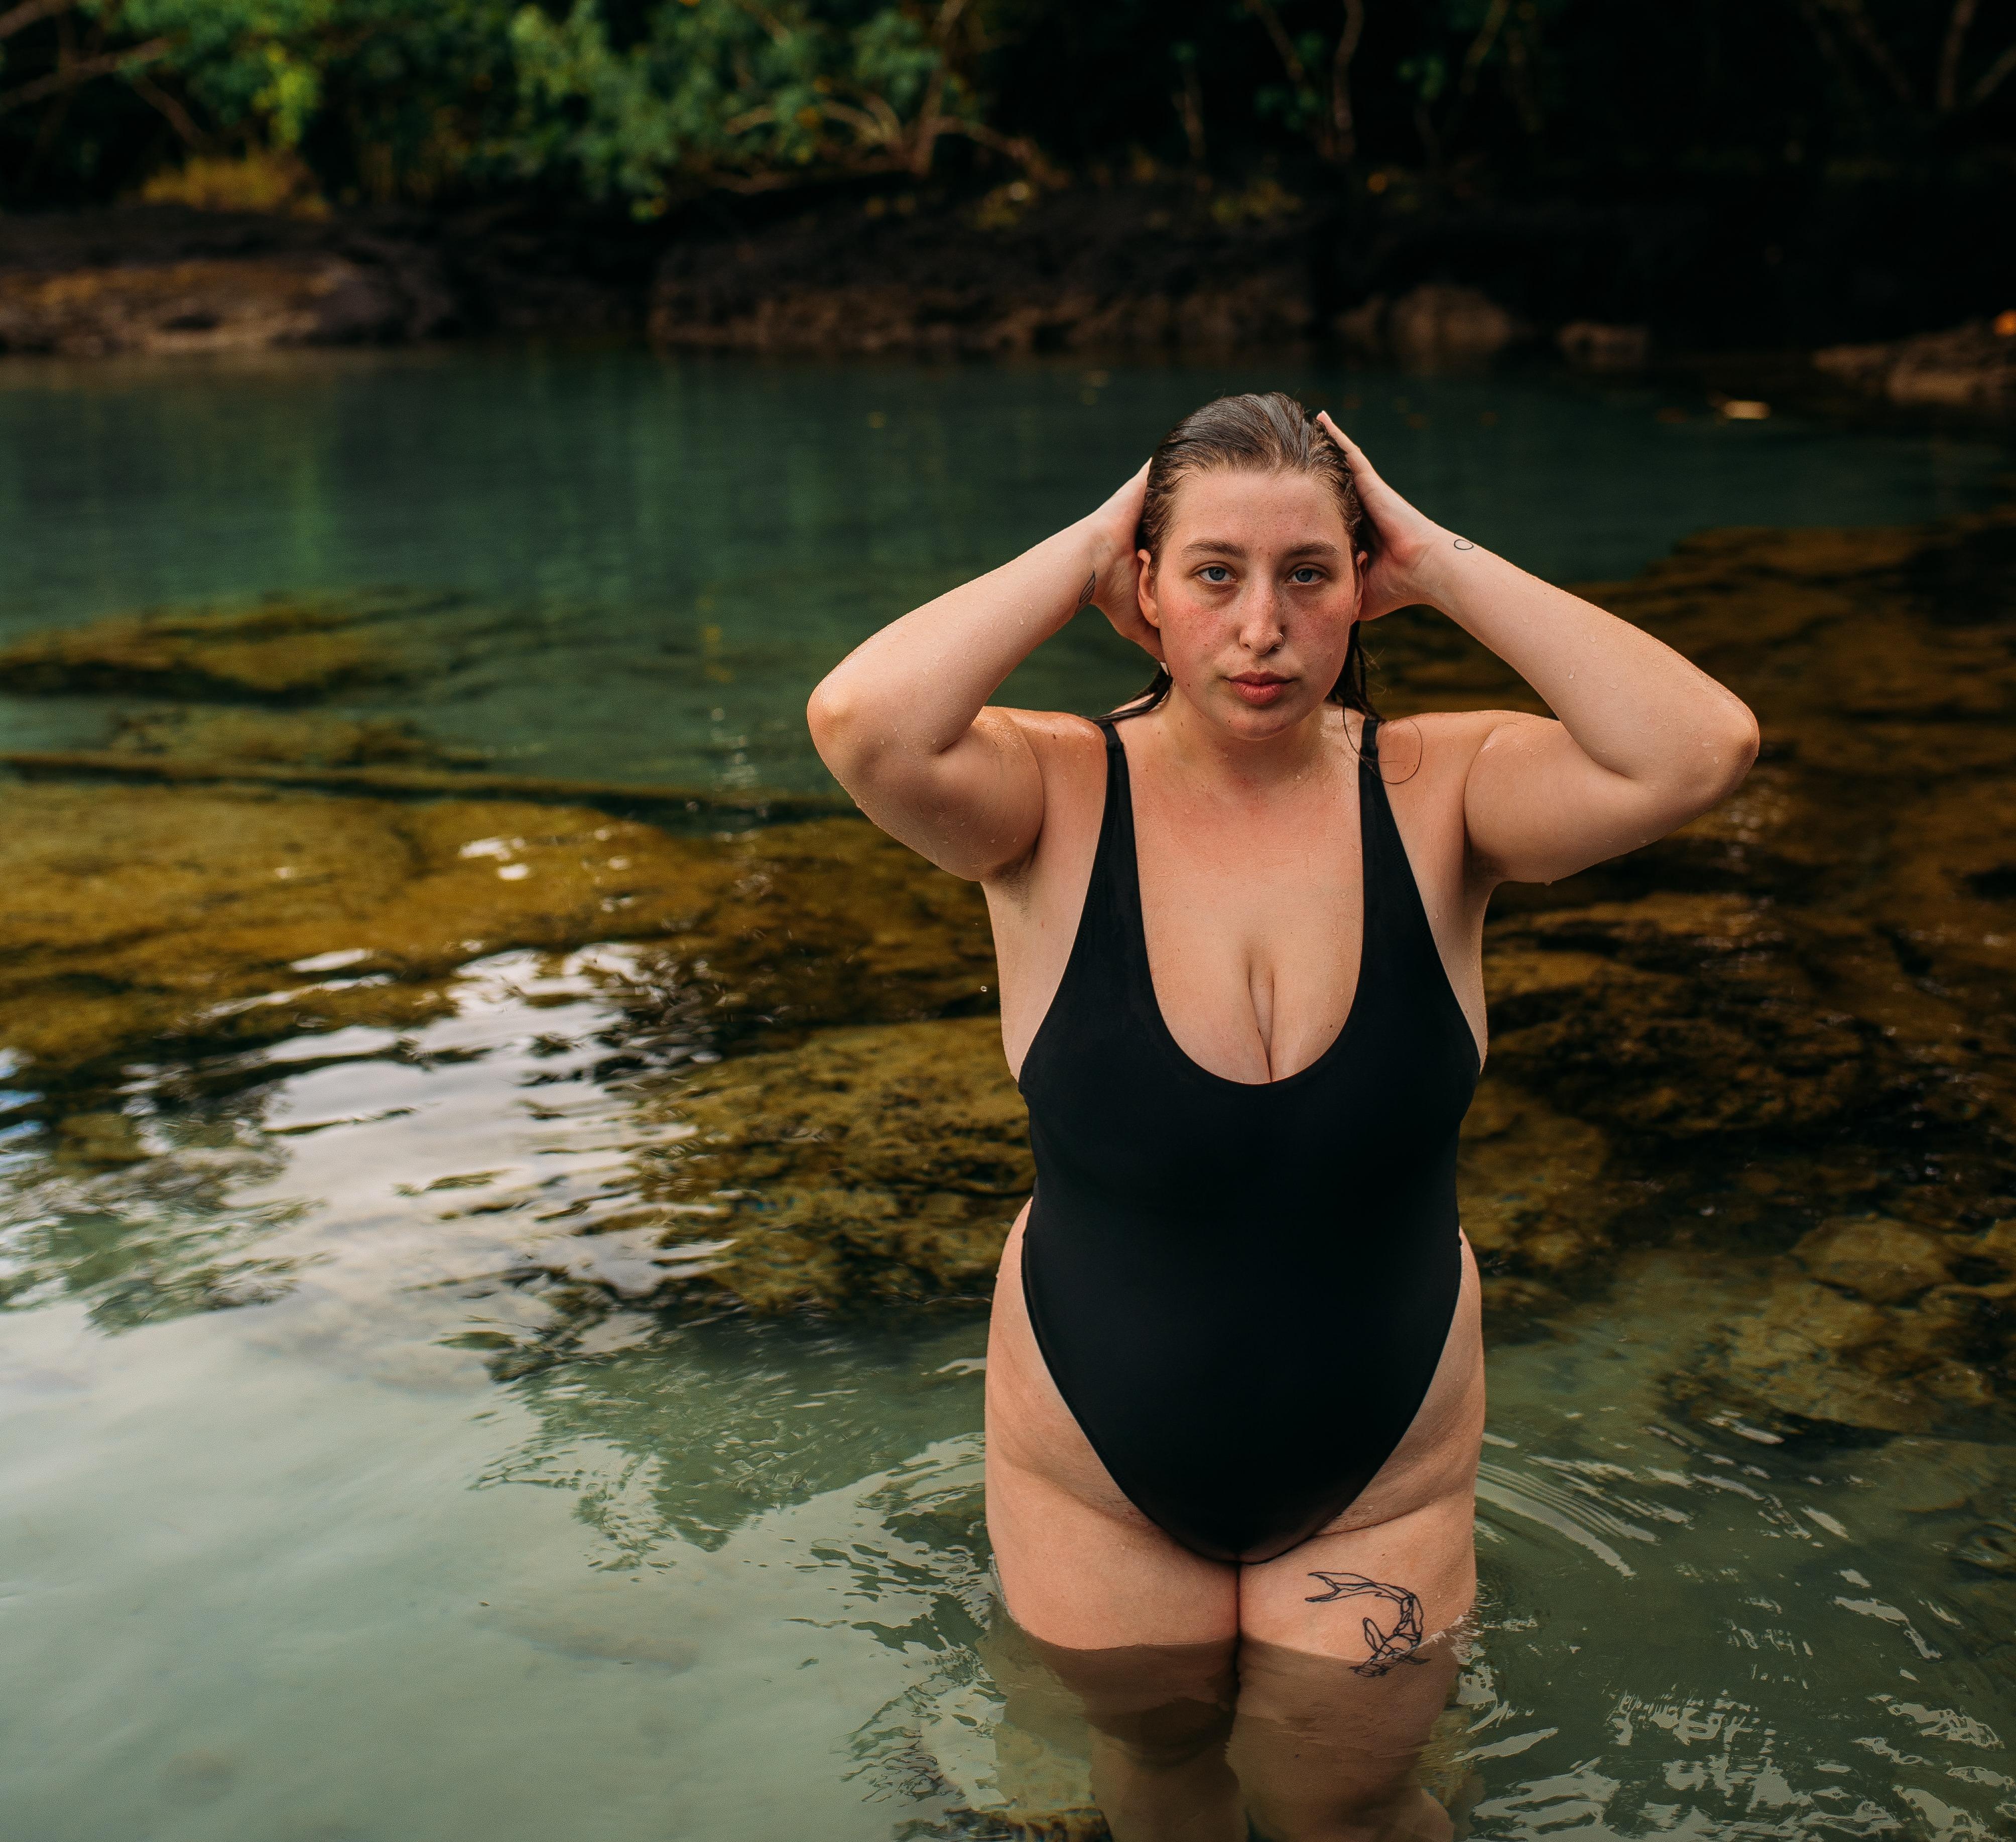 plus-sized woman in bathing suit